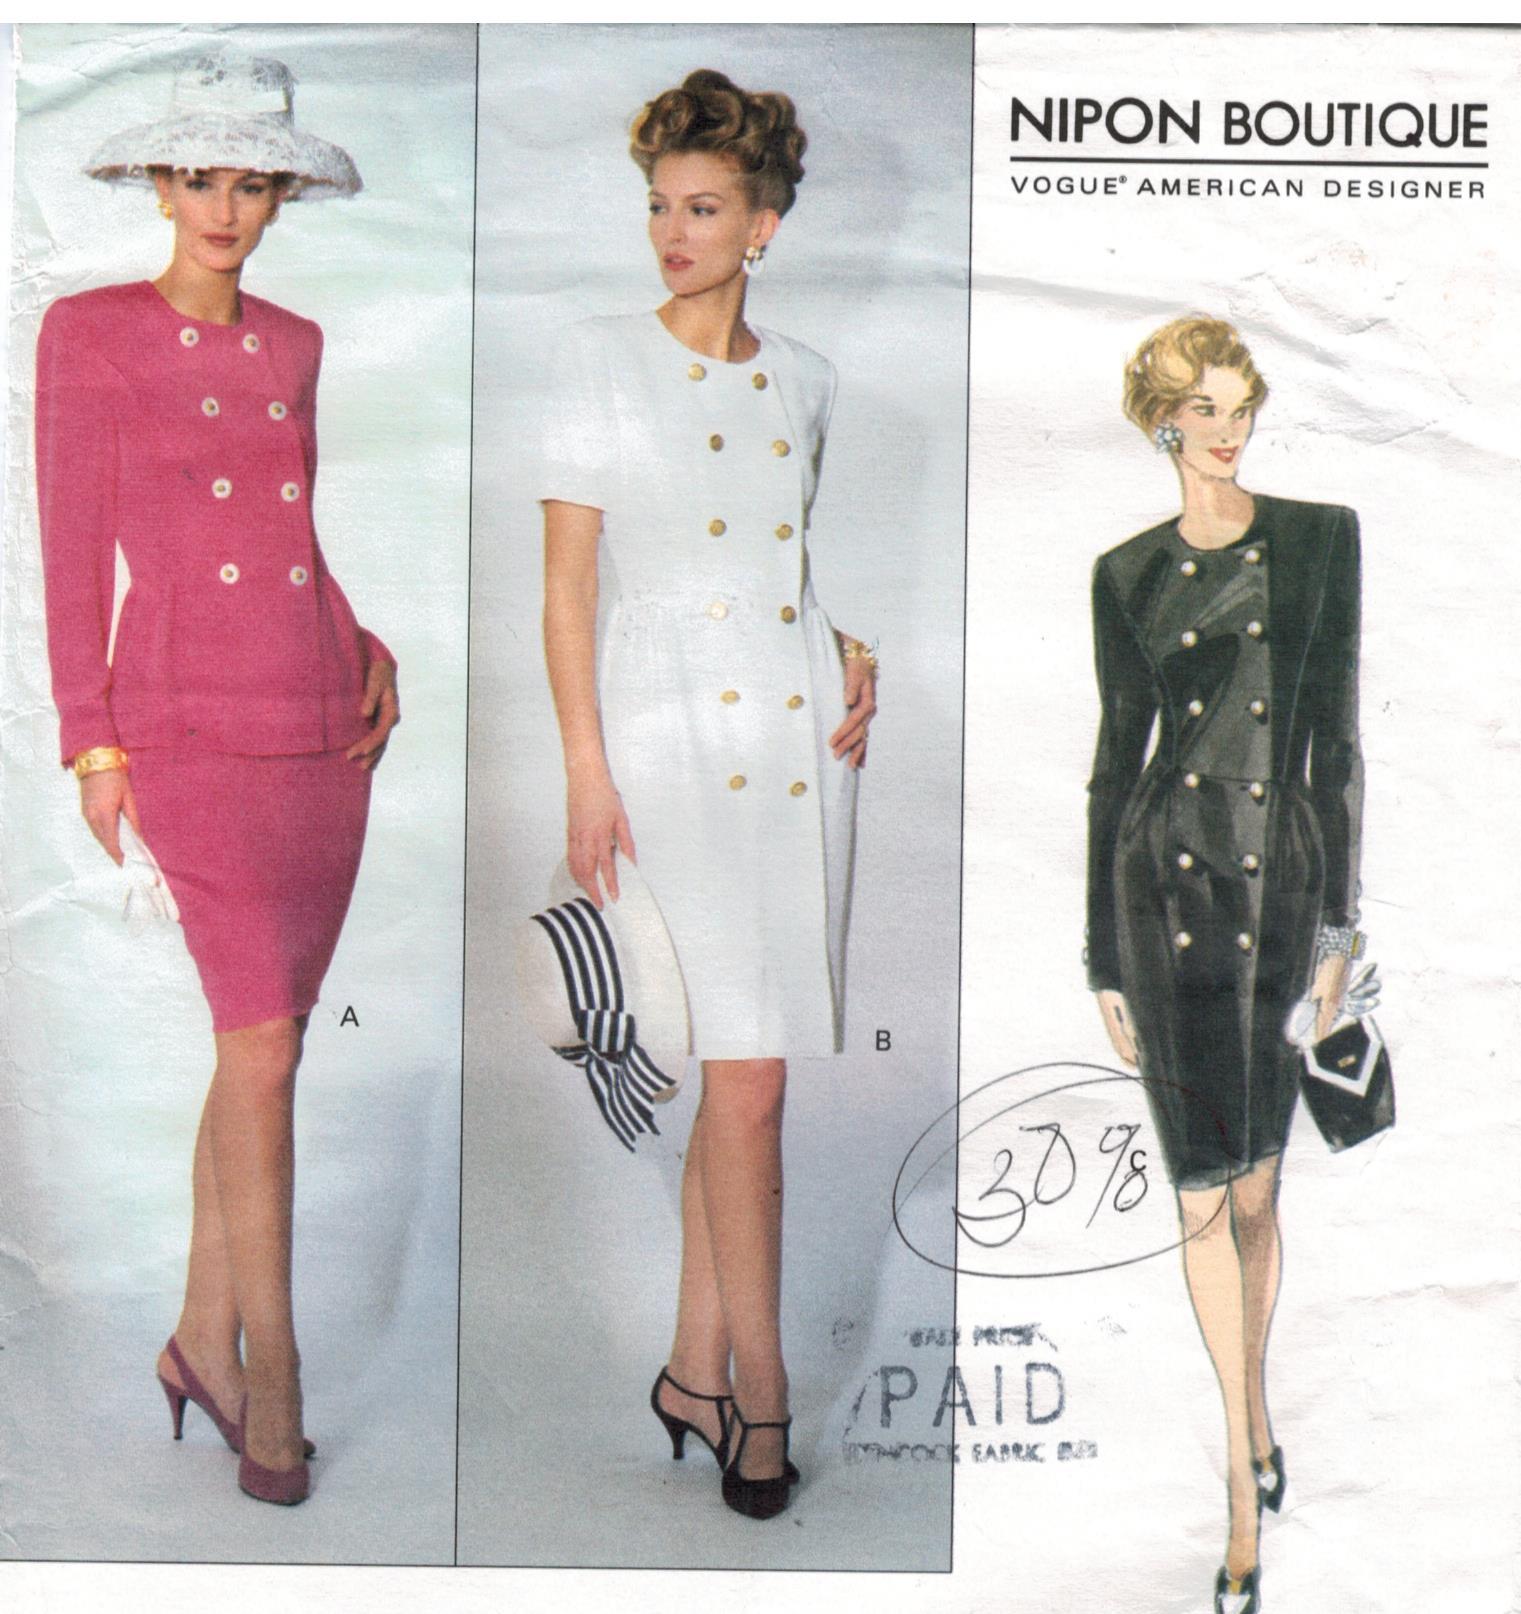 Vogue pattern 2889nipon boutique designer double breasted dress vogue pattern 2889nipon boutique designer double breasted dress jacket and pants size 12 14 16 jeuxipadfo Image collections